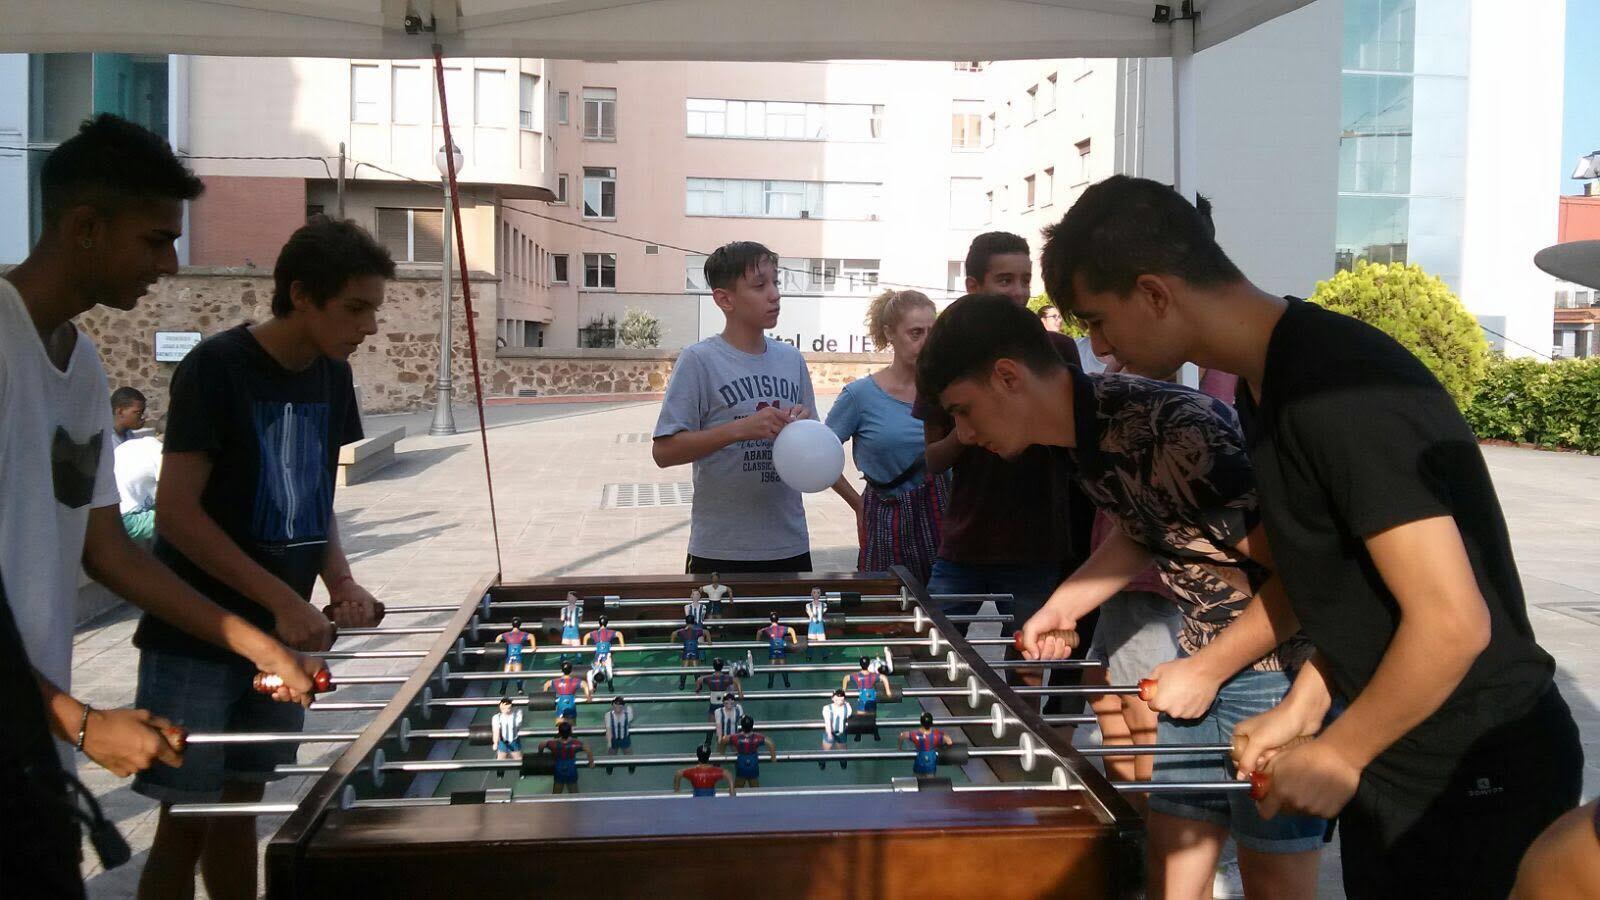 Concurs Futbolí Concurso Futbolín